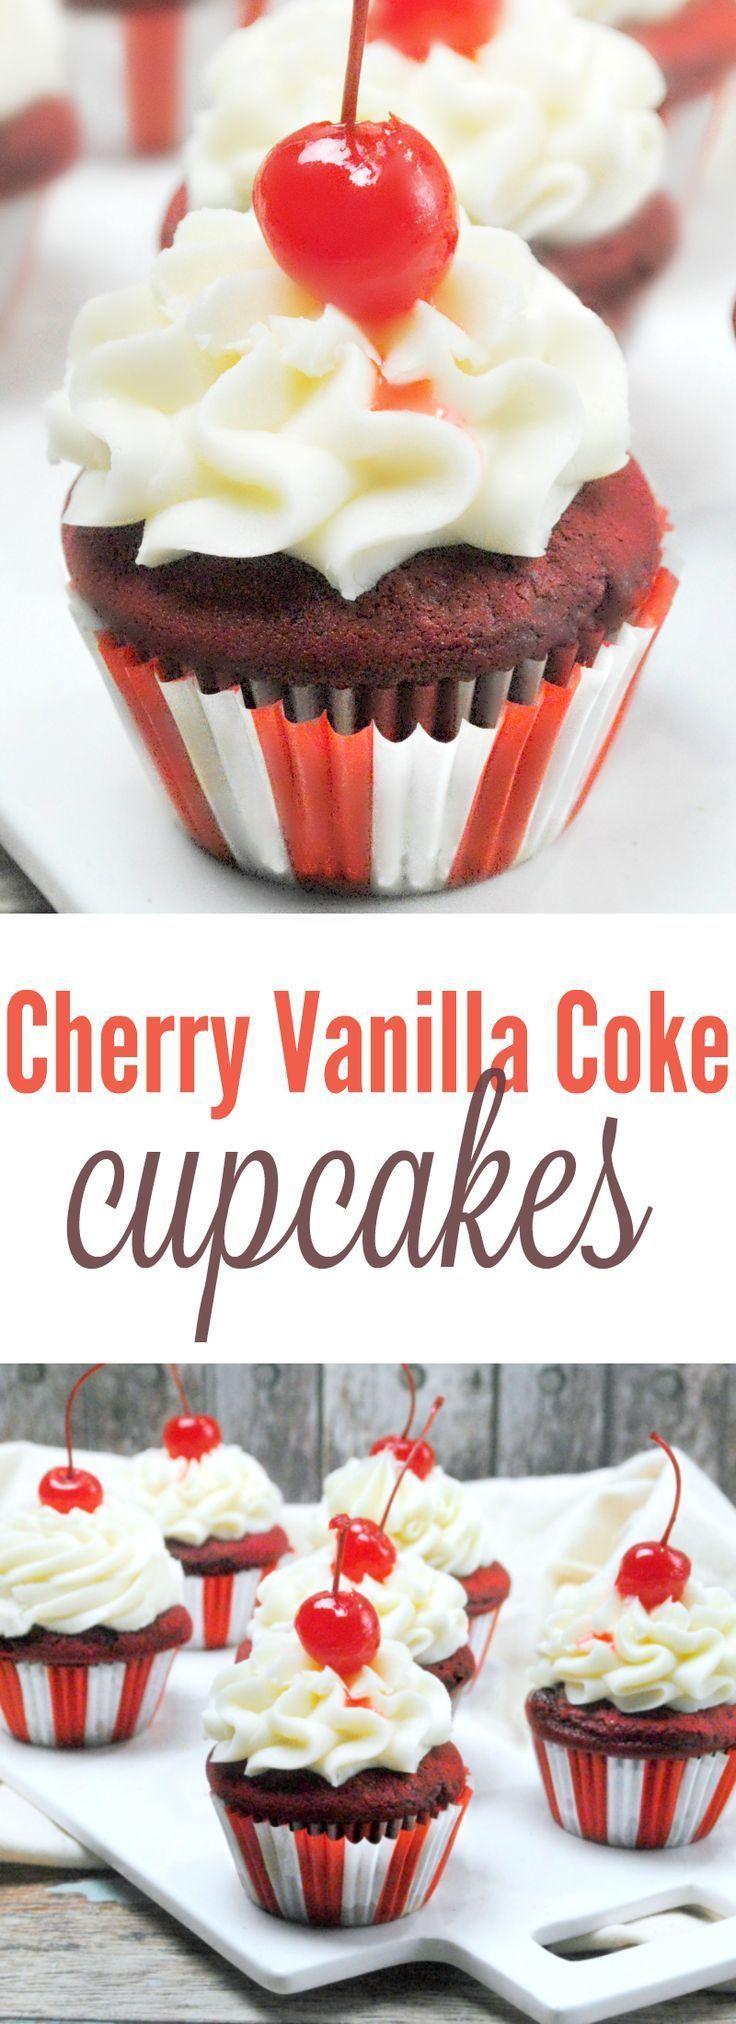 Cherry Vanilla Coke Cupcakes Recipe - These taste AMAZING! My new favorite cupcake recipe!!